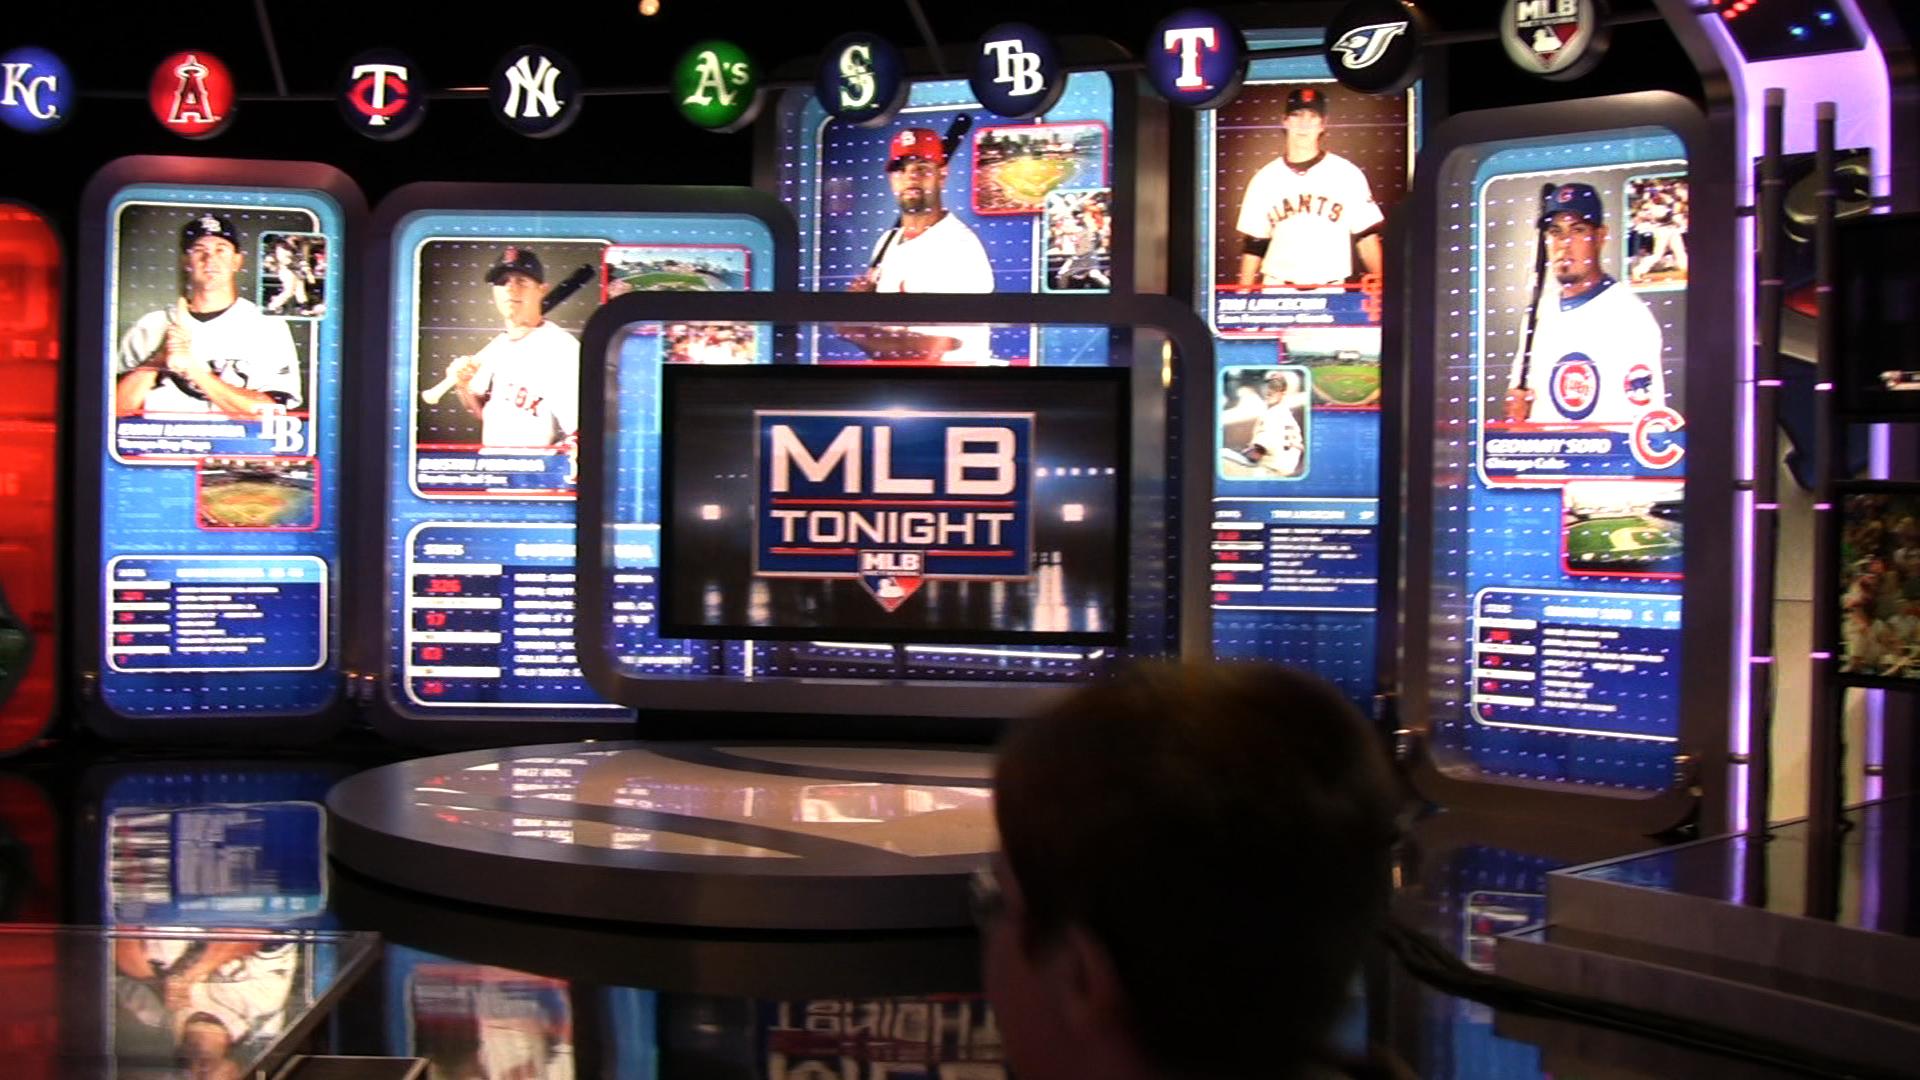 Kids at MLB Network 12.jpg